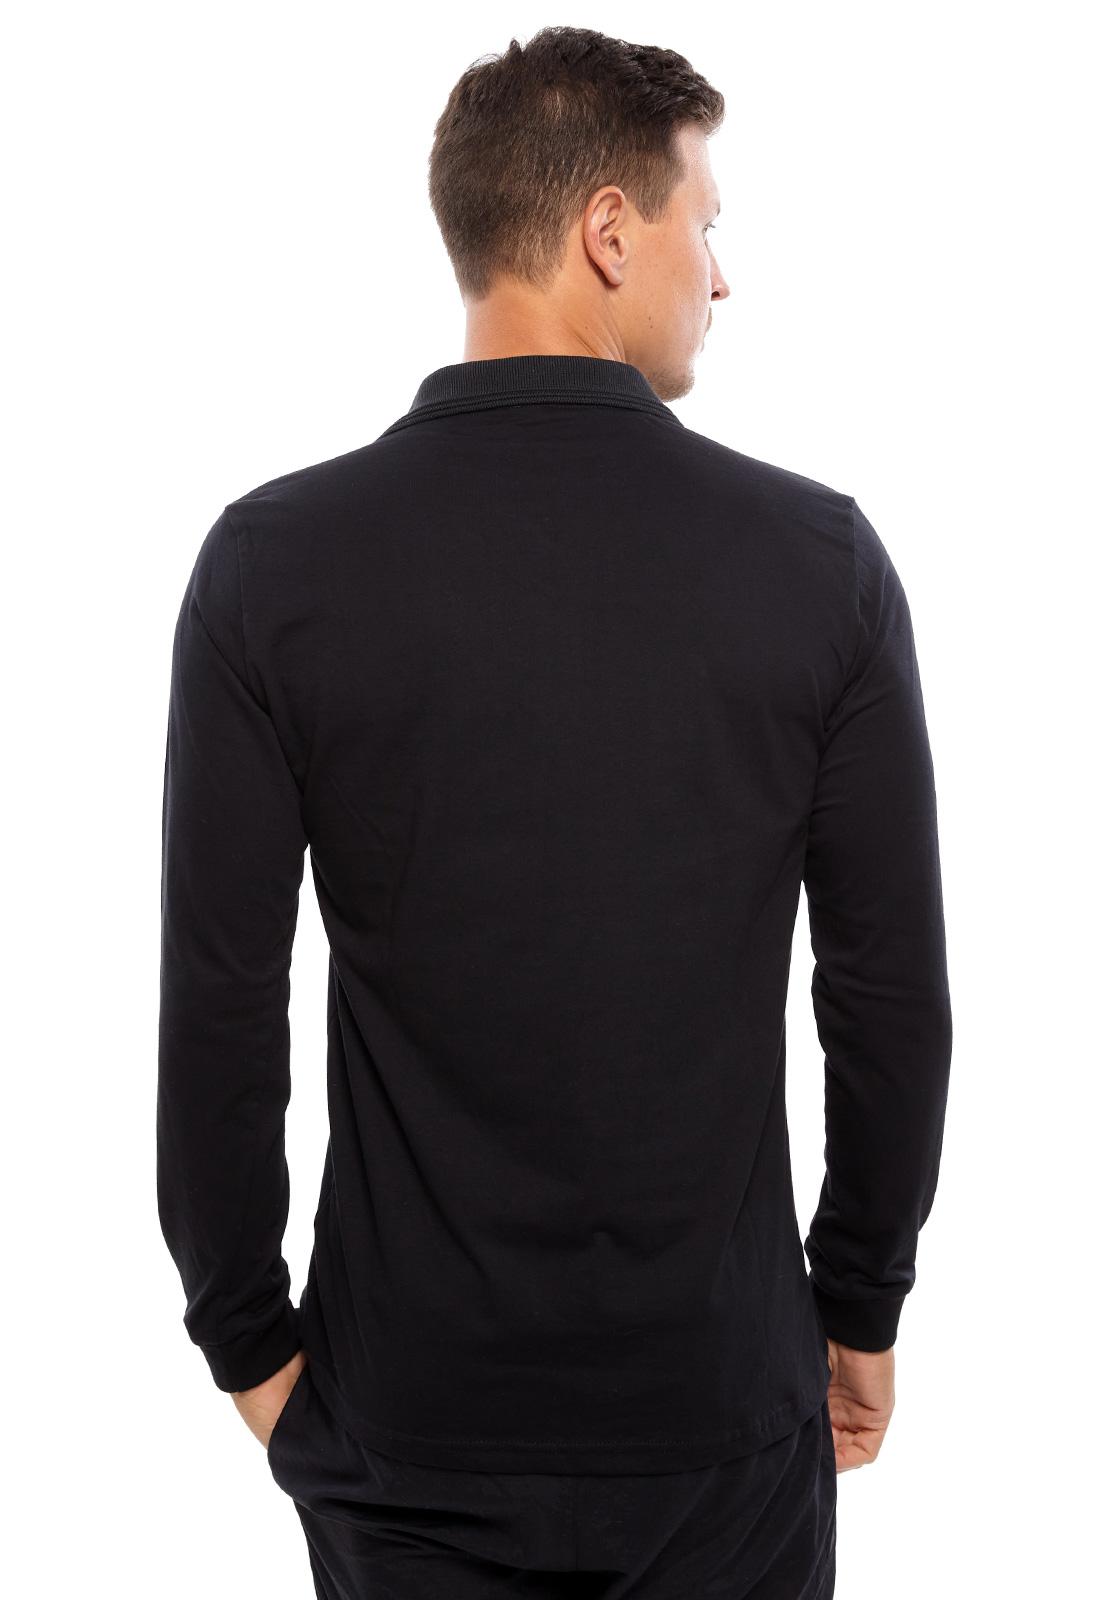 Camisa Polo Vida Marinha Manga Longa Preto/Cinza